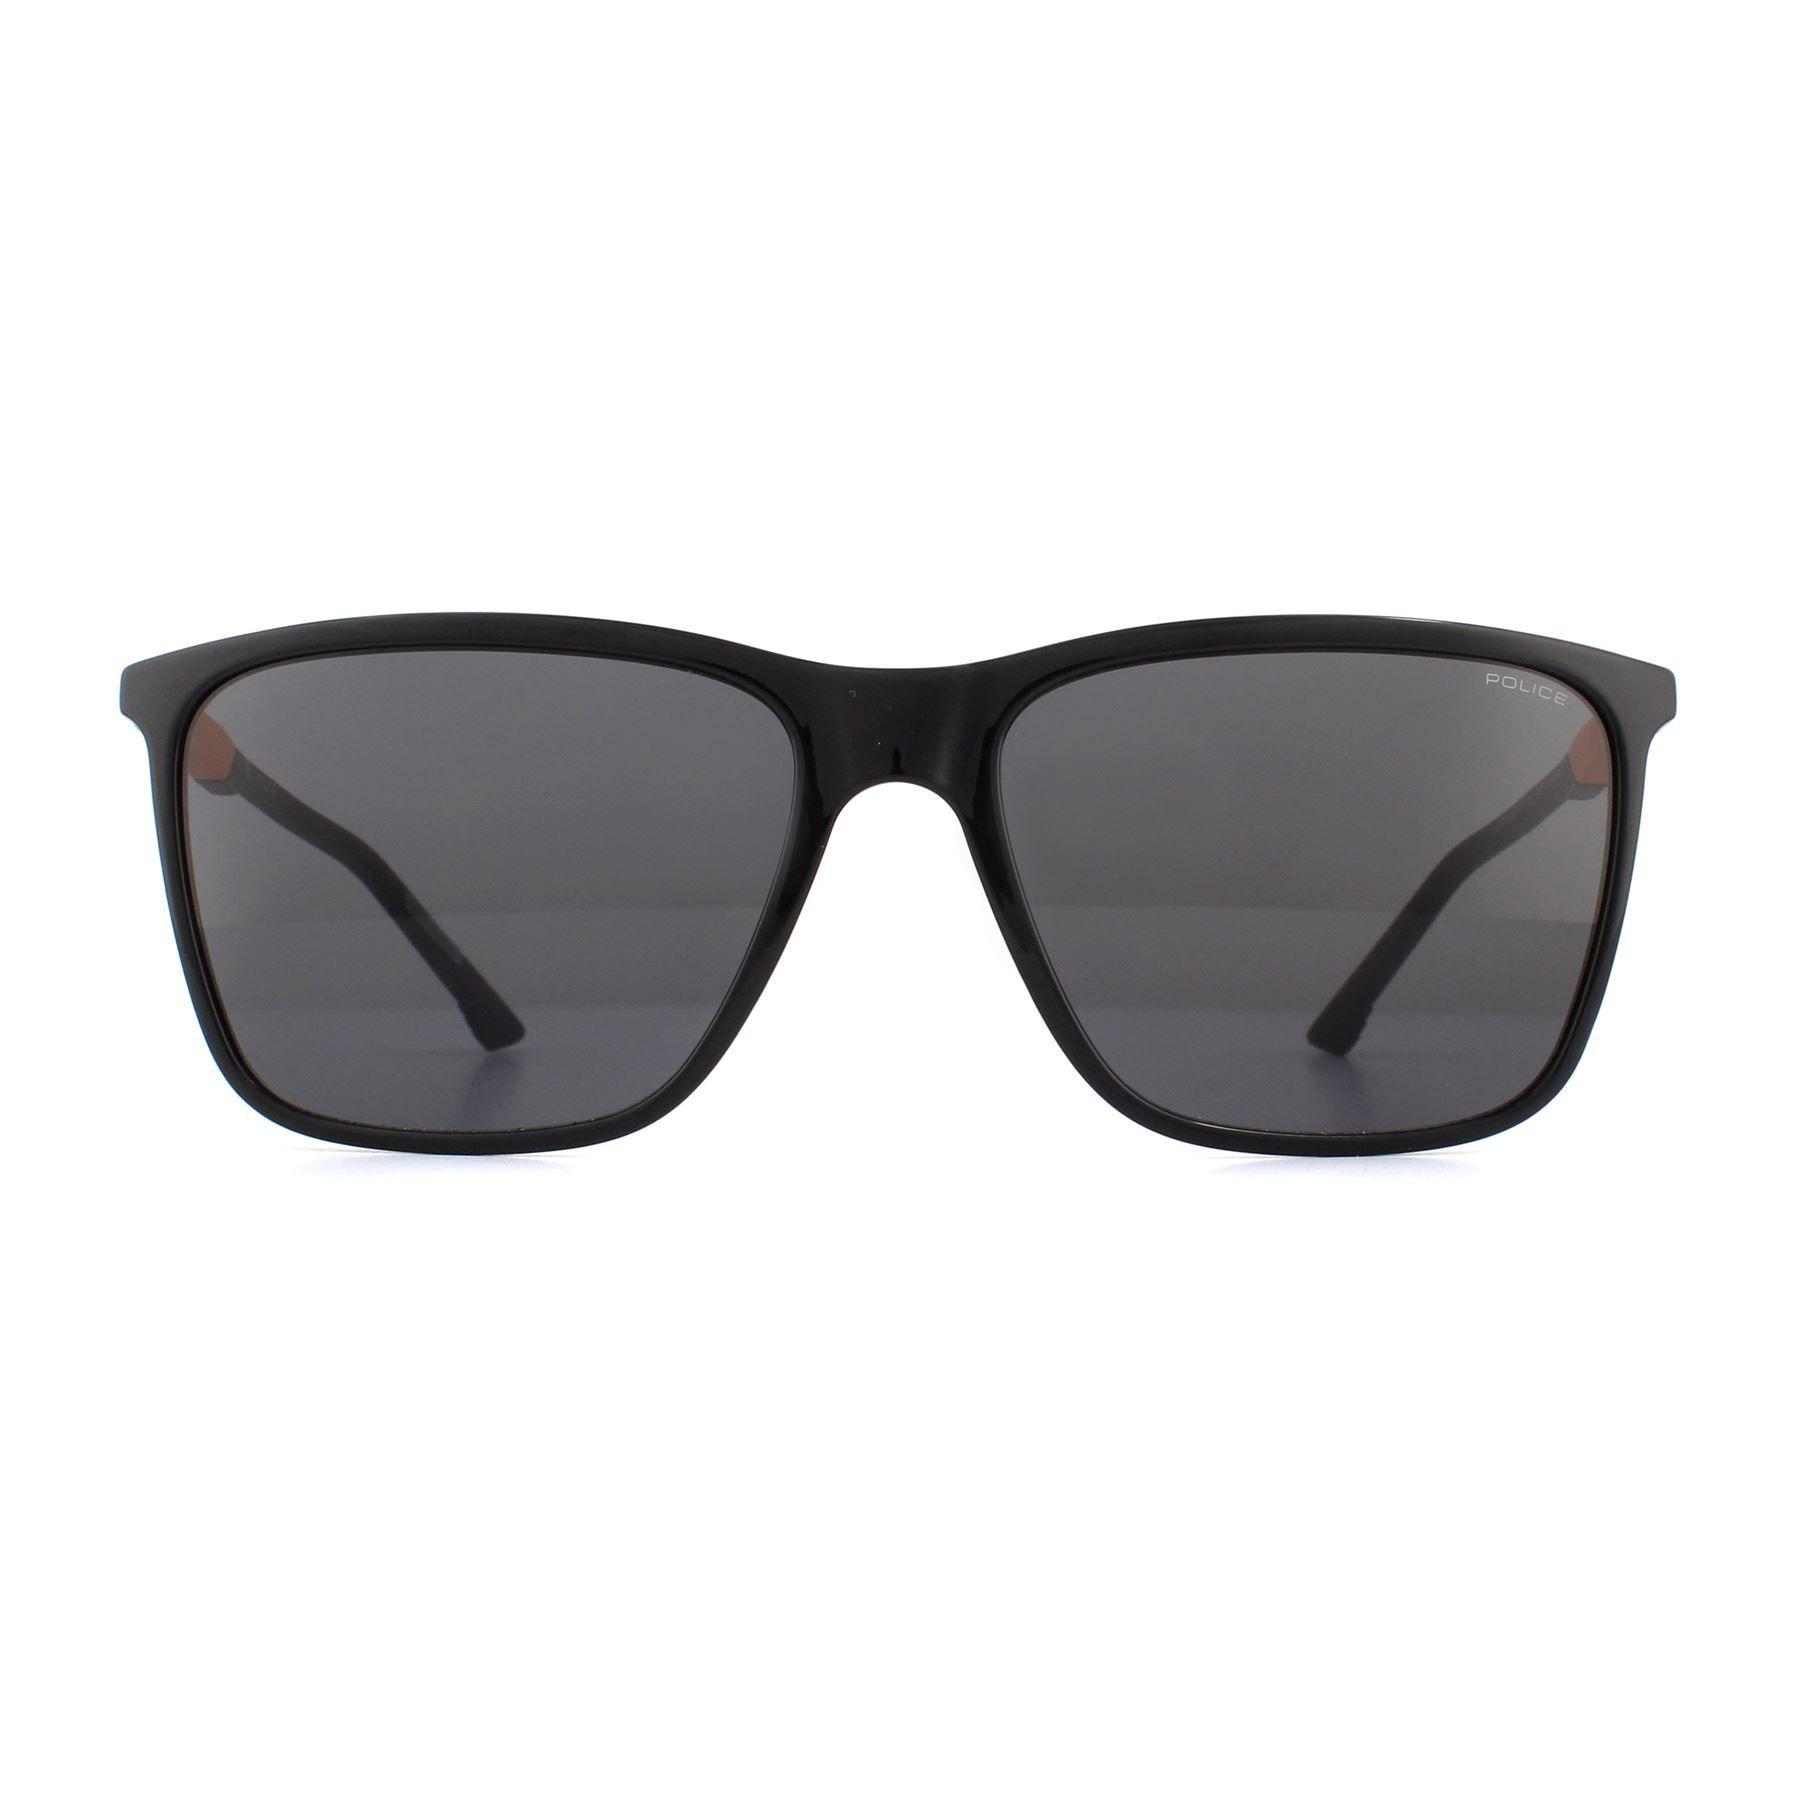 Police Sunglasses SPL716 Storm Light 1 0Z42 Shiny Black Smoke